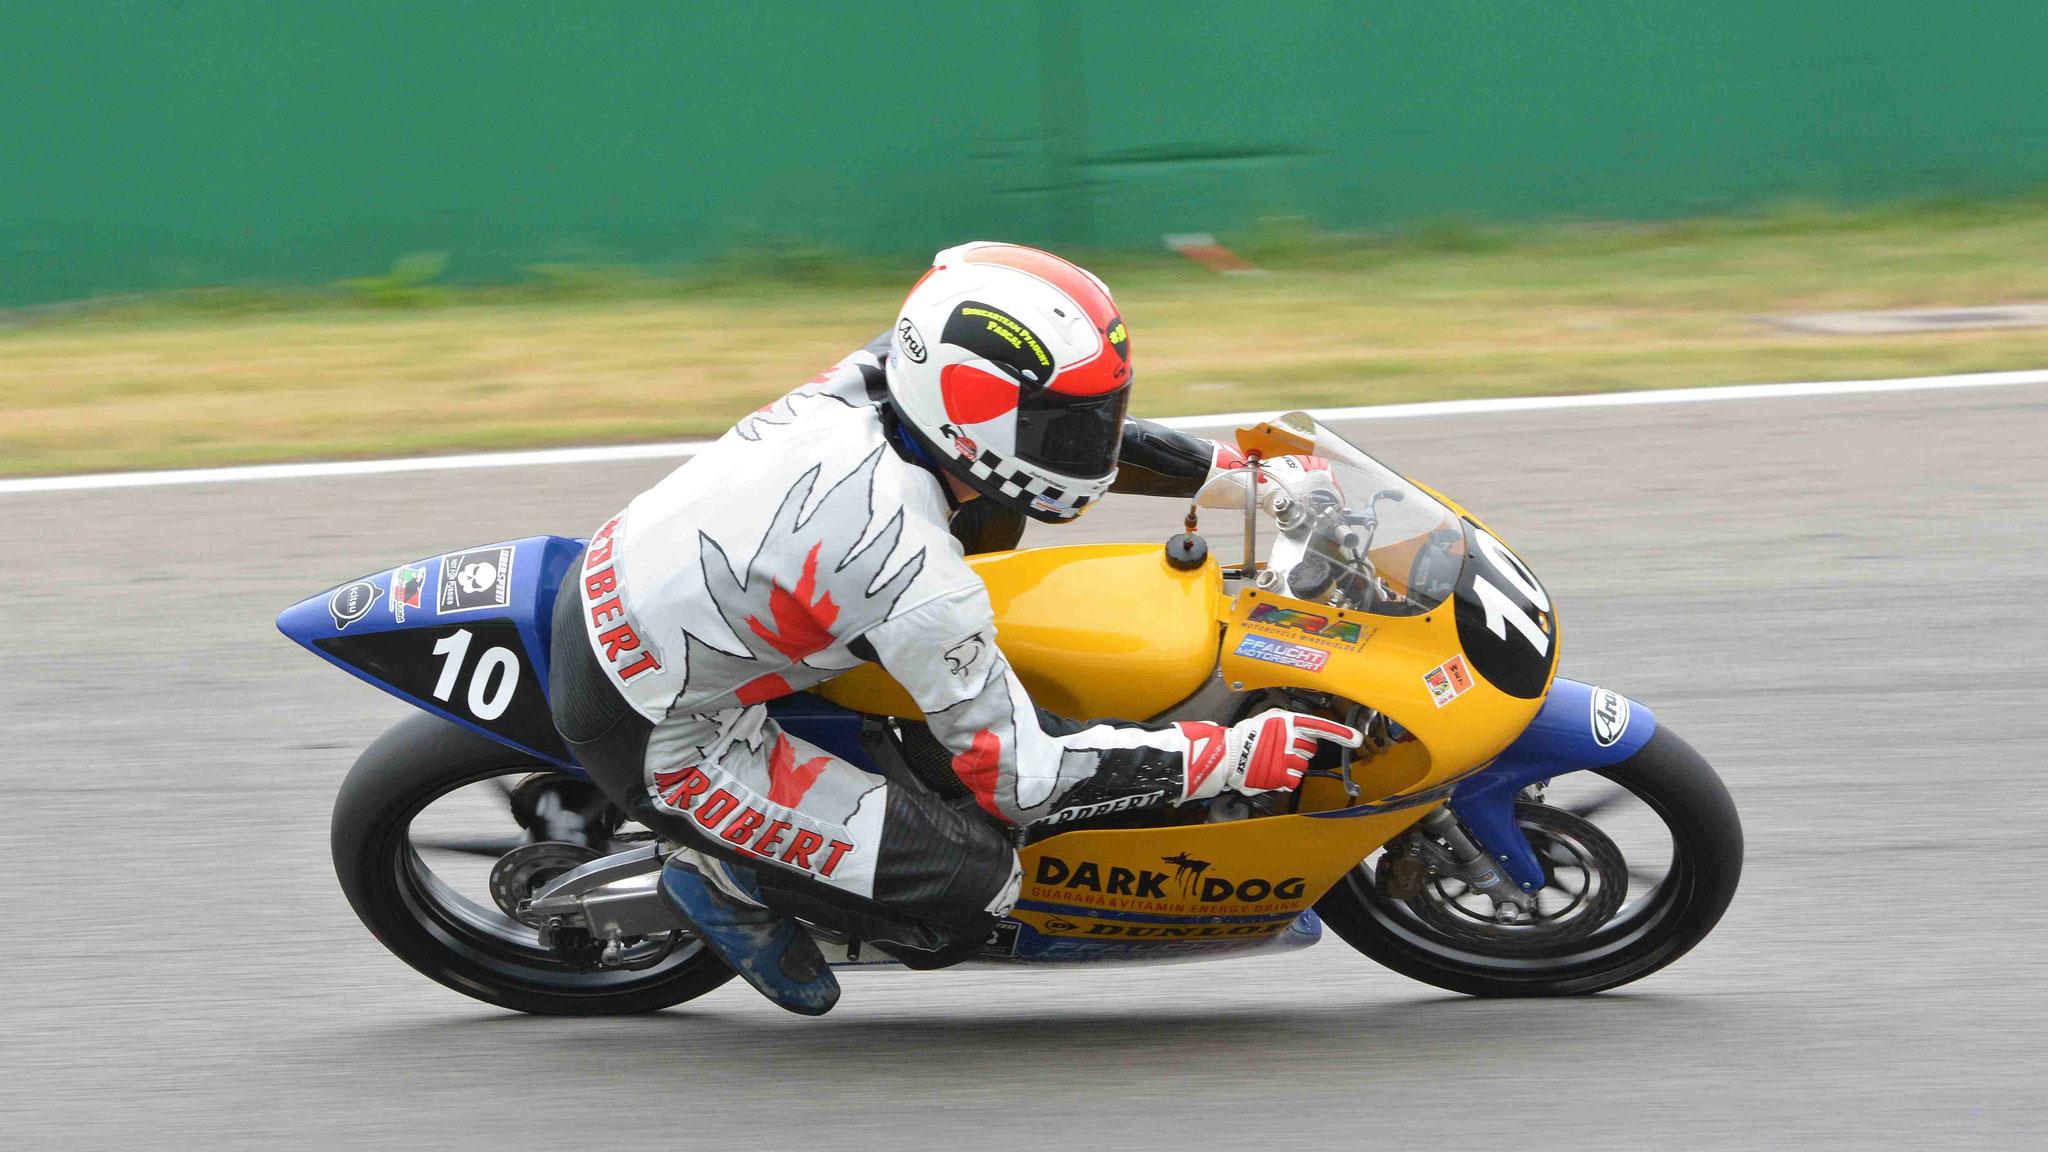 Pascal Pfaucht - HONDA RS125 - 1997